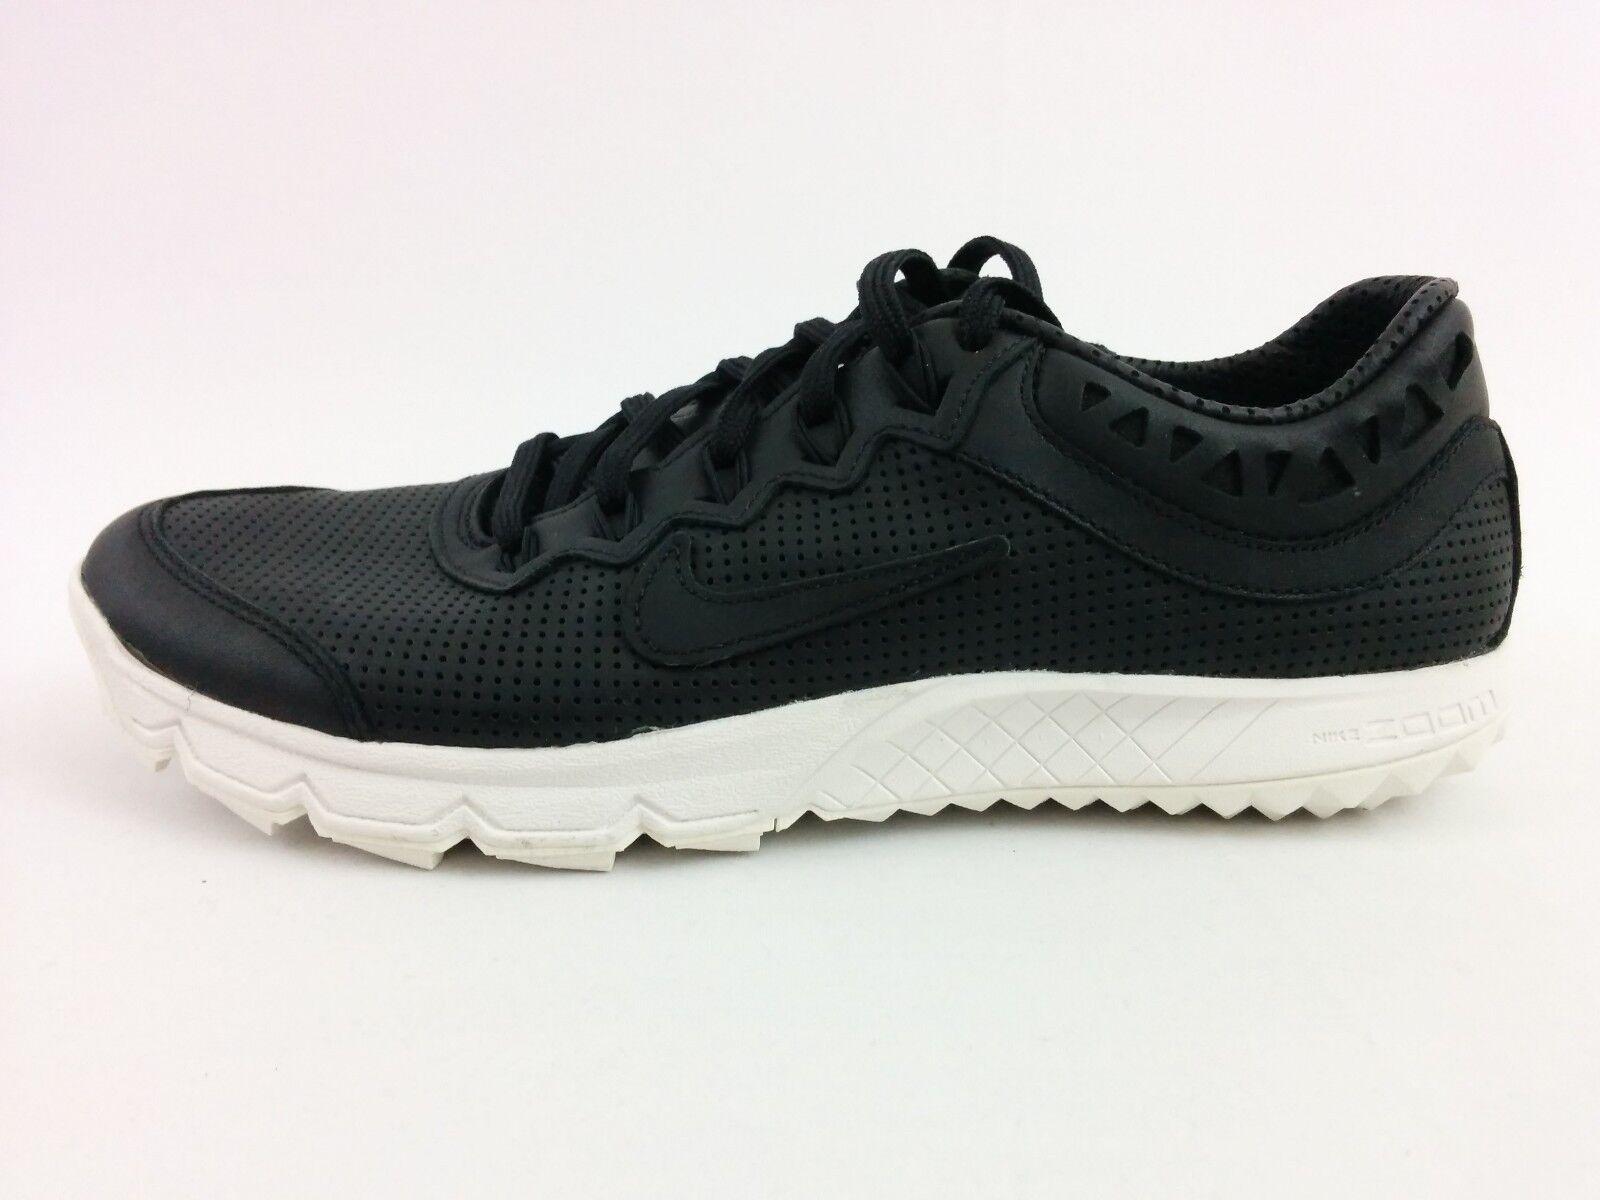 Nike NikeLab Zoom Terra Kiger 2 Black sz 8.5 DS 813041 011 New in Box